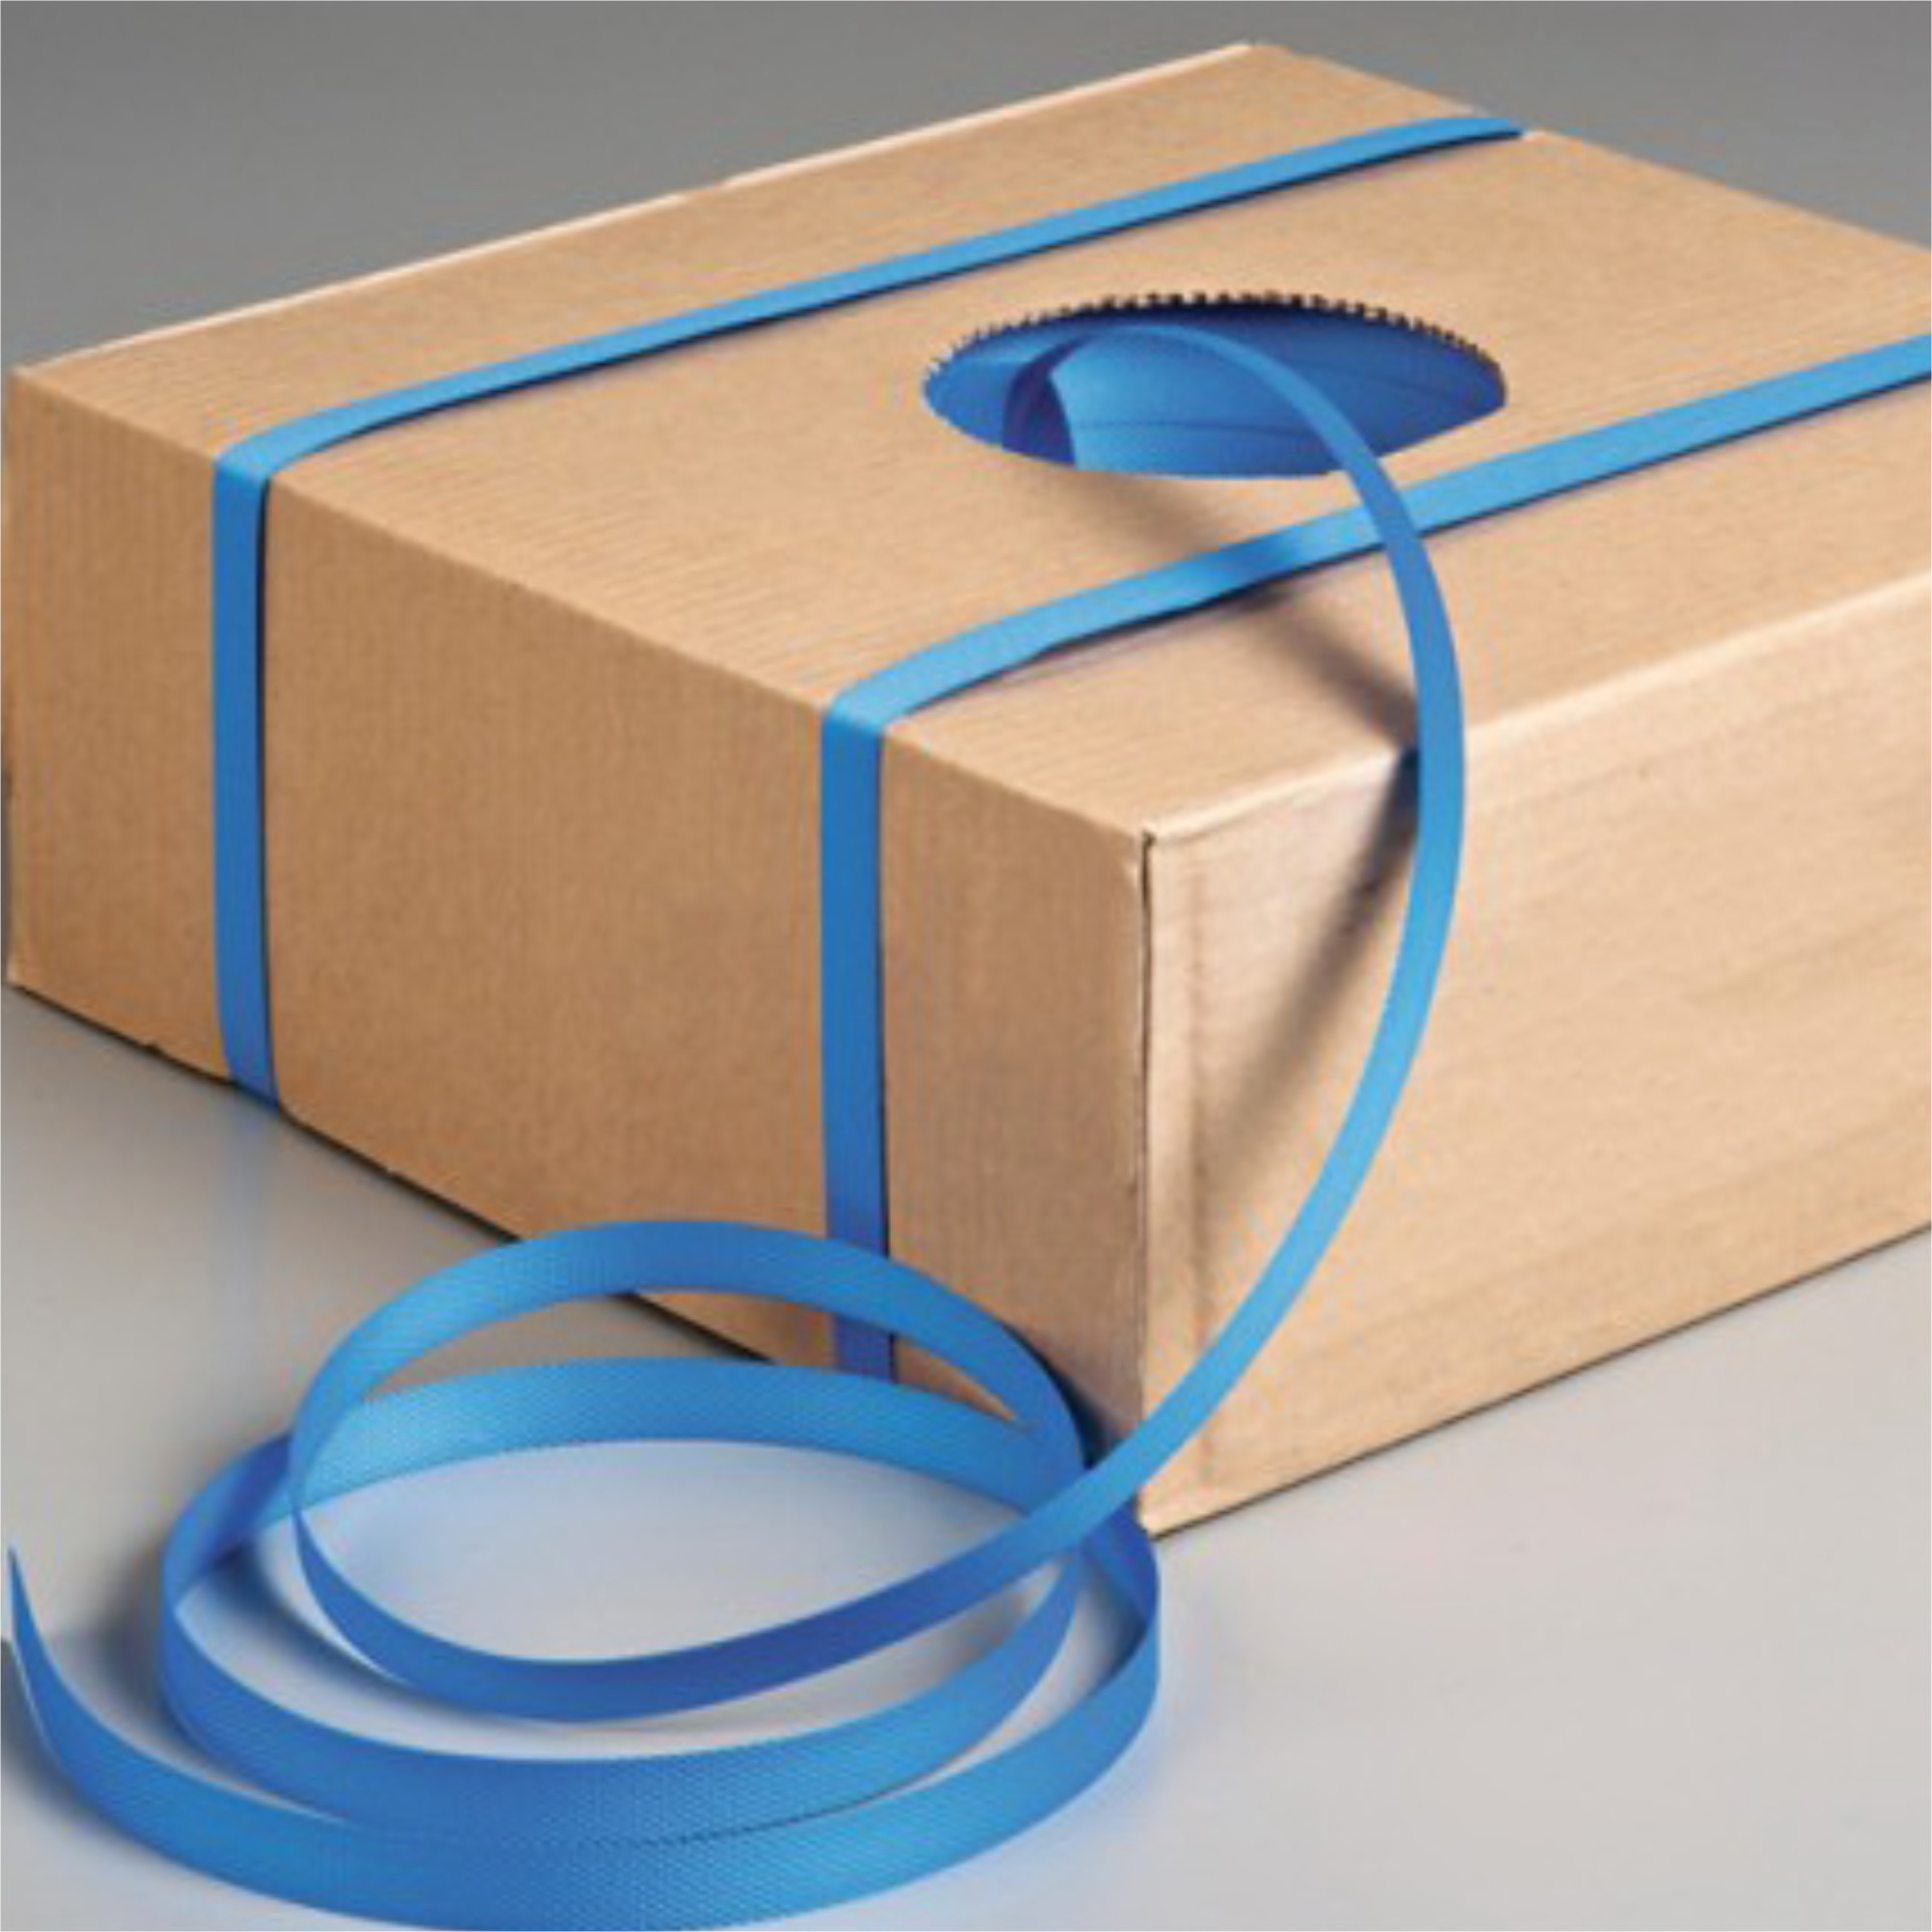 15mm x 1000m Plastic Hand Strap Blue Polypropylene Strapping